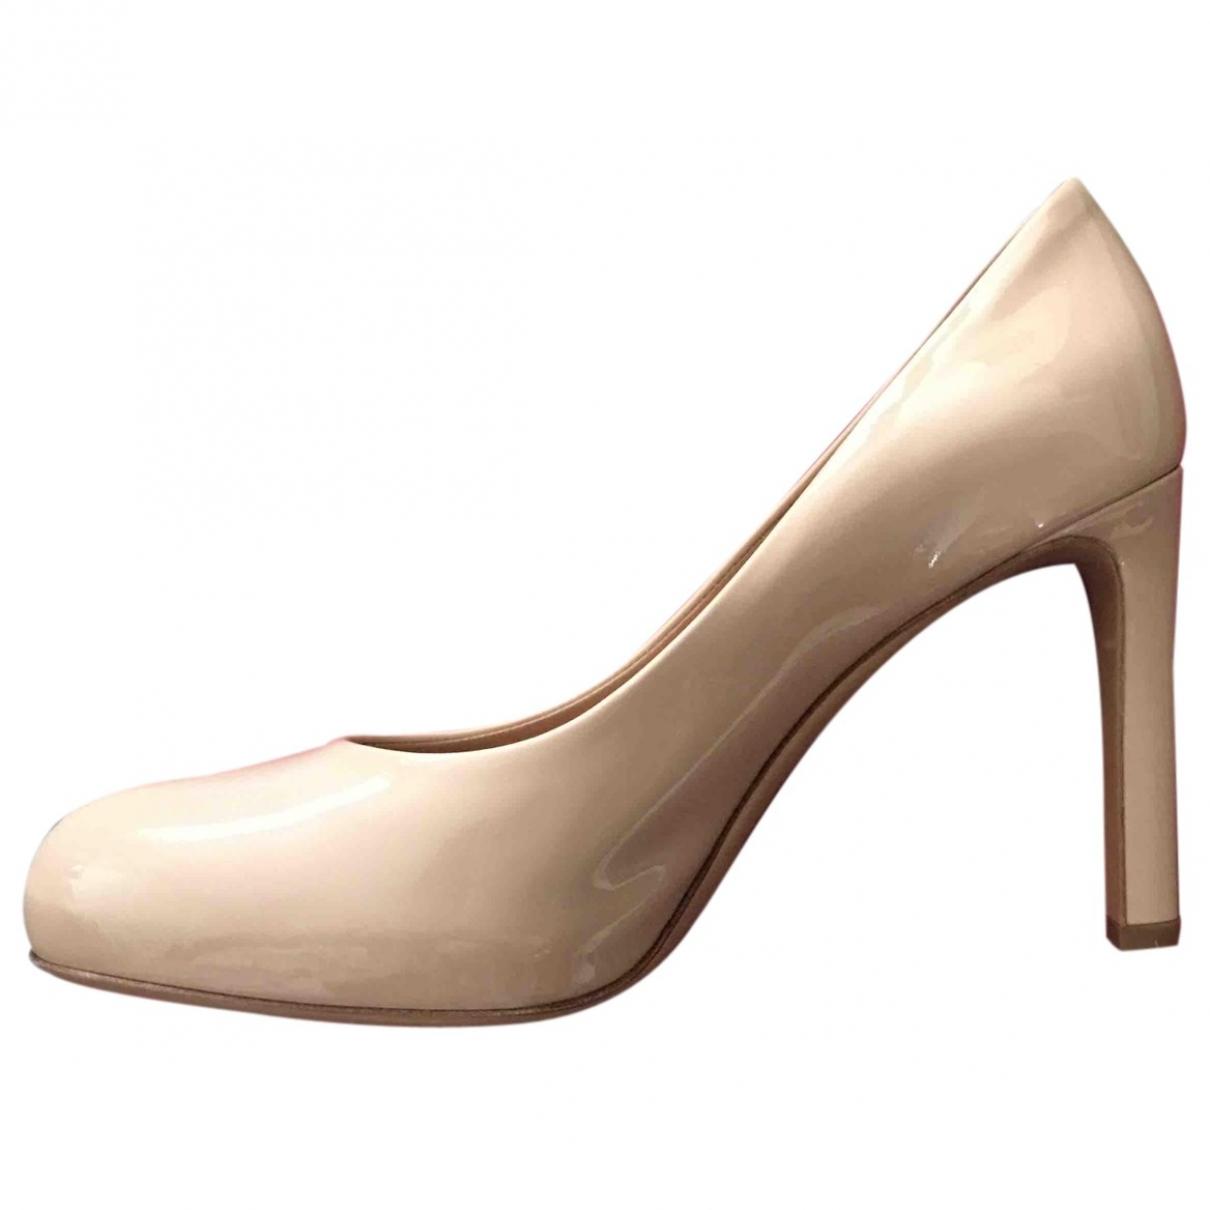 Salvatore Ferragamo \N Beige Patent leather Heels for Women 37 EU